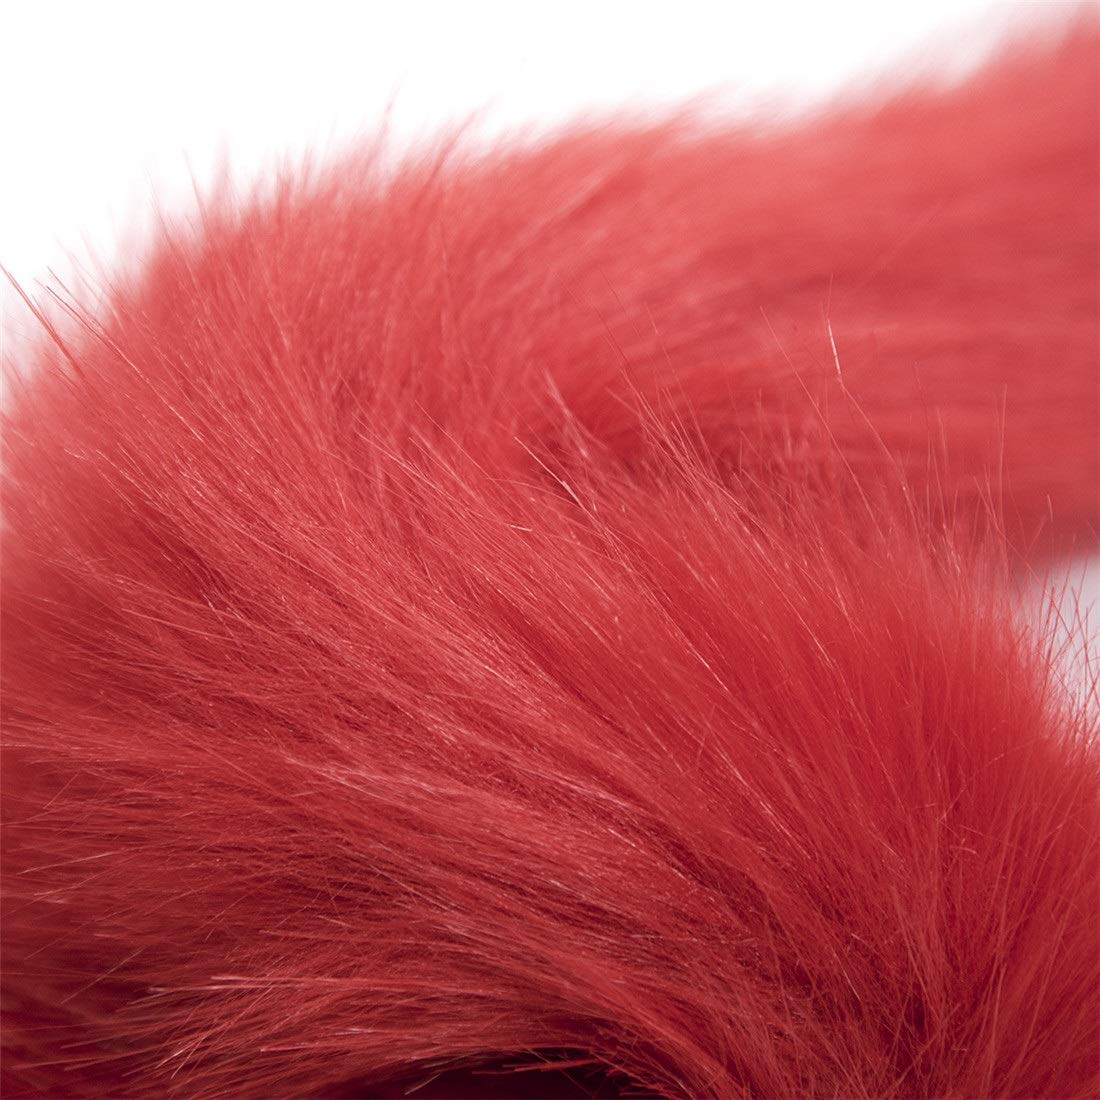 Hemotrade Products Mini Punto Anal G Vibrador Anal Punto Tail Fox Tail Anal Plug Fox Cola Juguetes para Adultos Juguetes eróticos Butt Plug Sex Shop (Color : blanco-Silicone Vibrating) 70fa4a